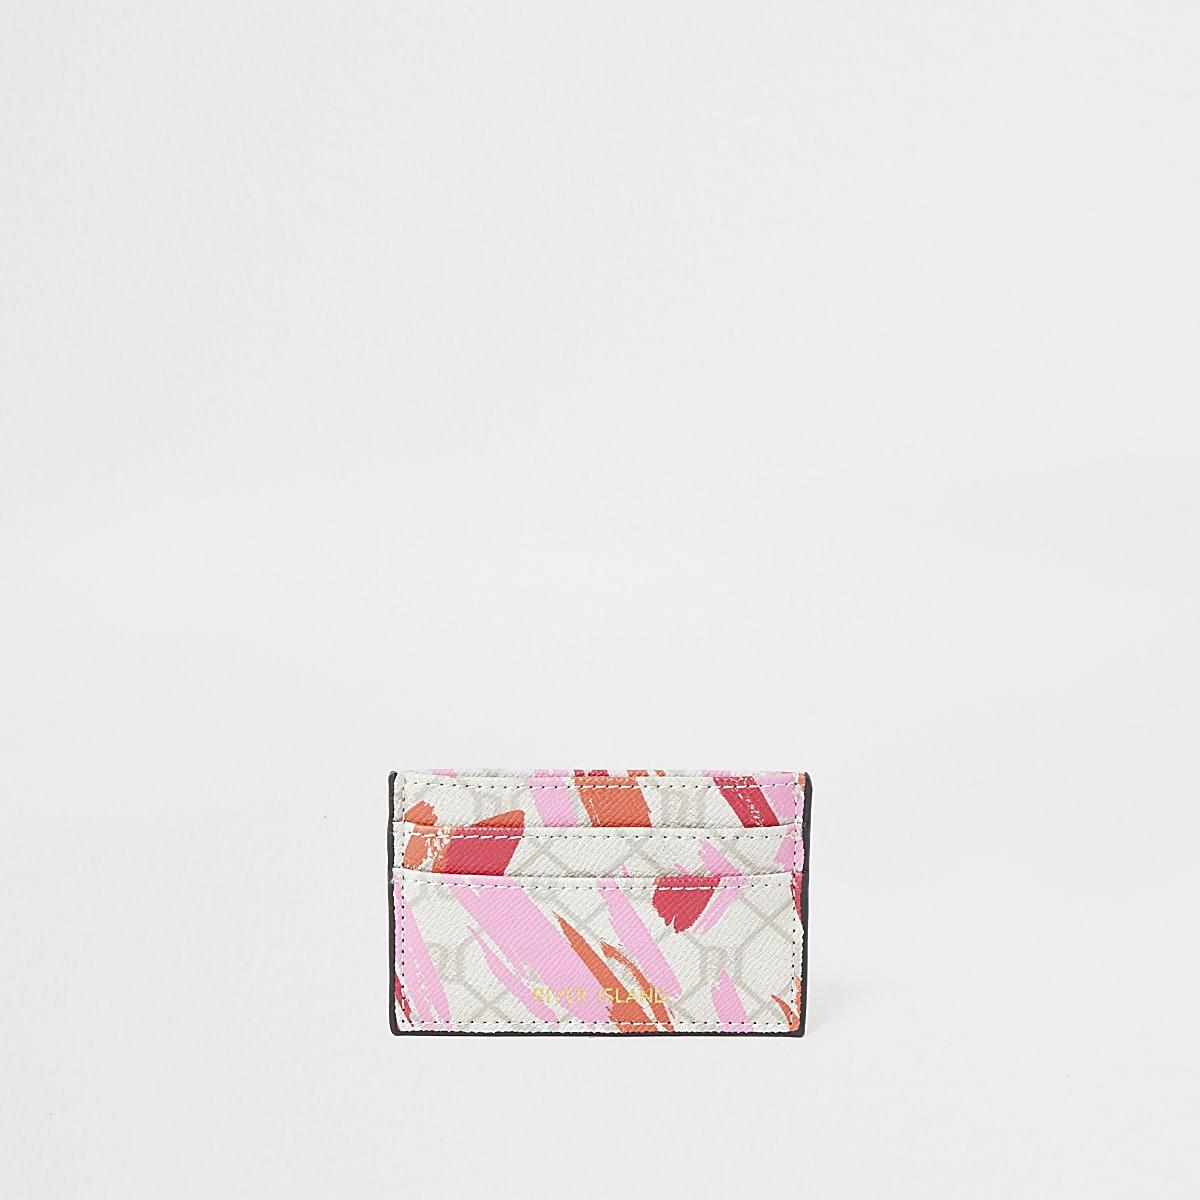 Pink RI lipstick smudge card holder